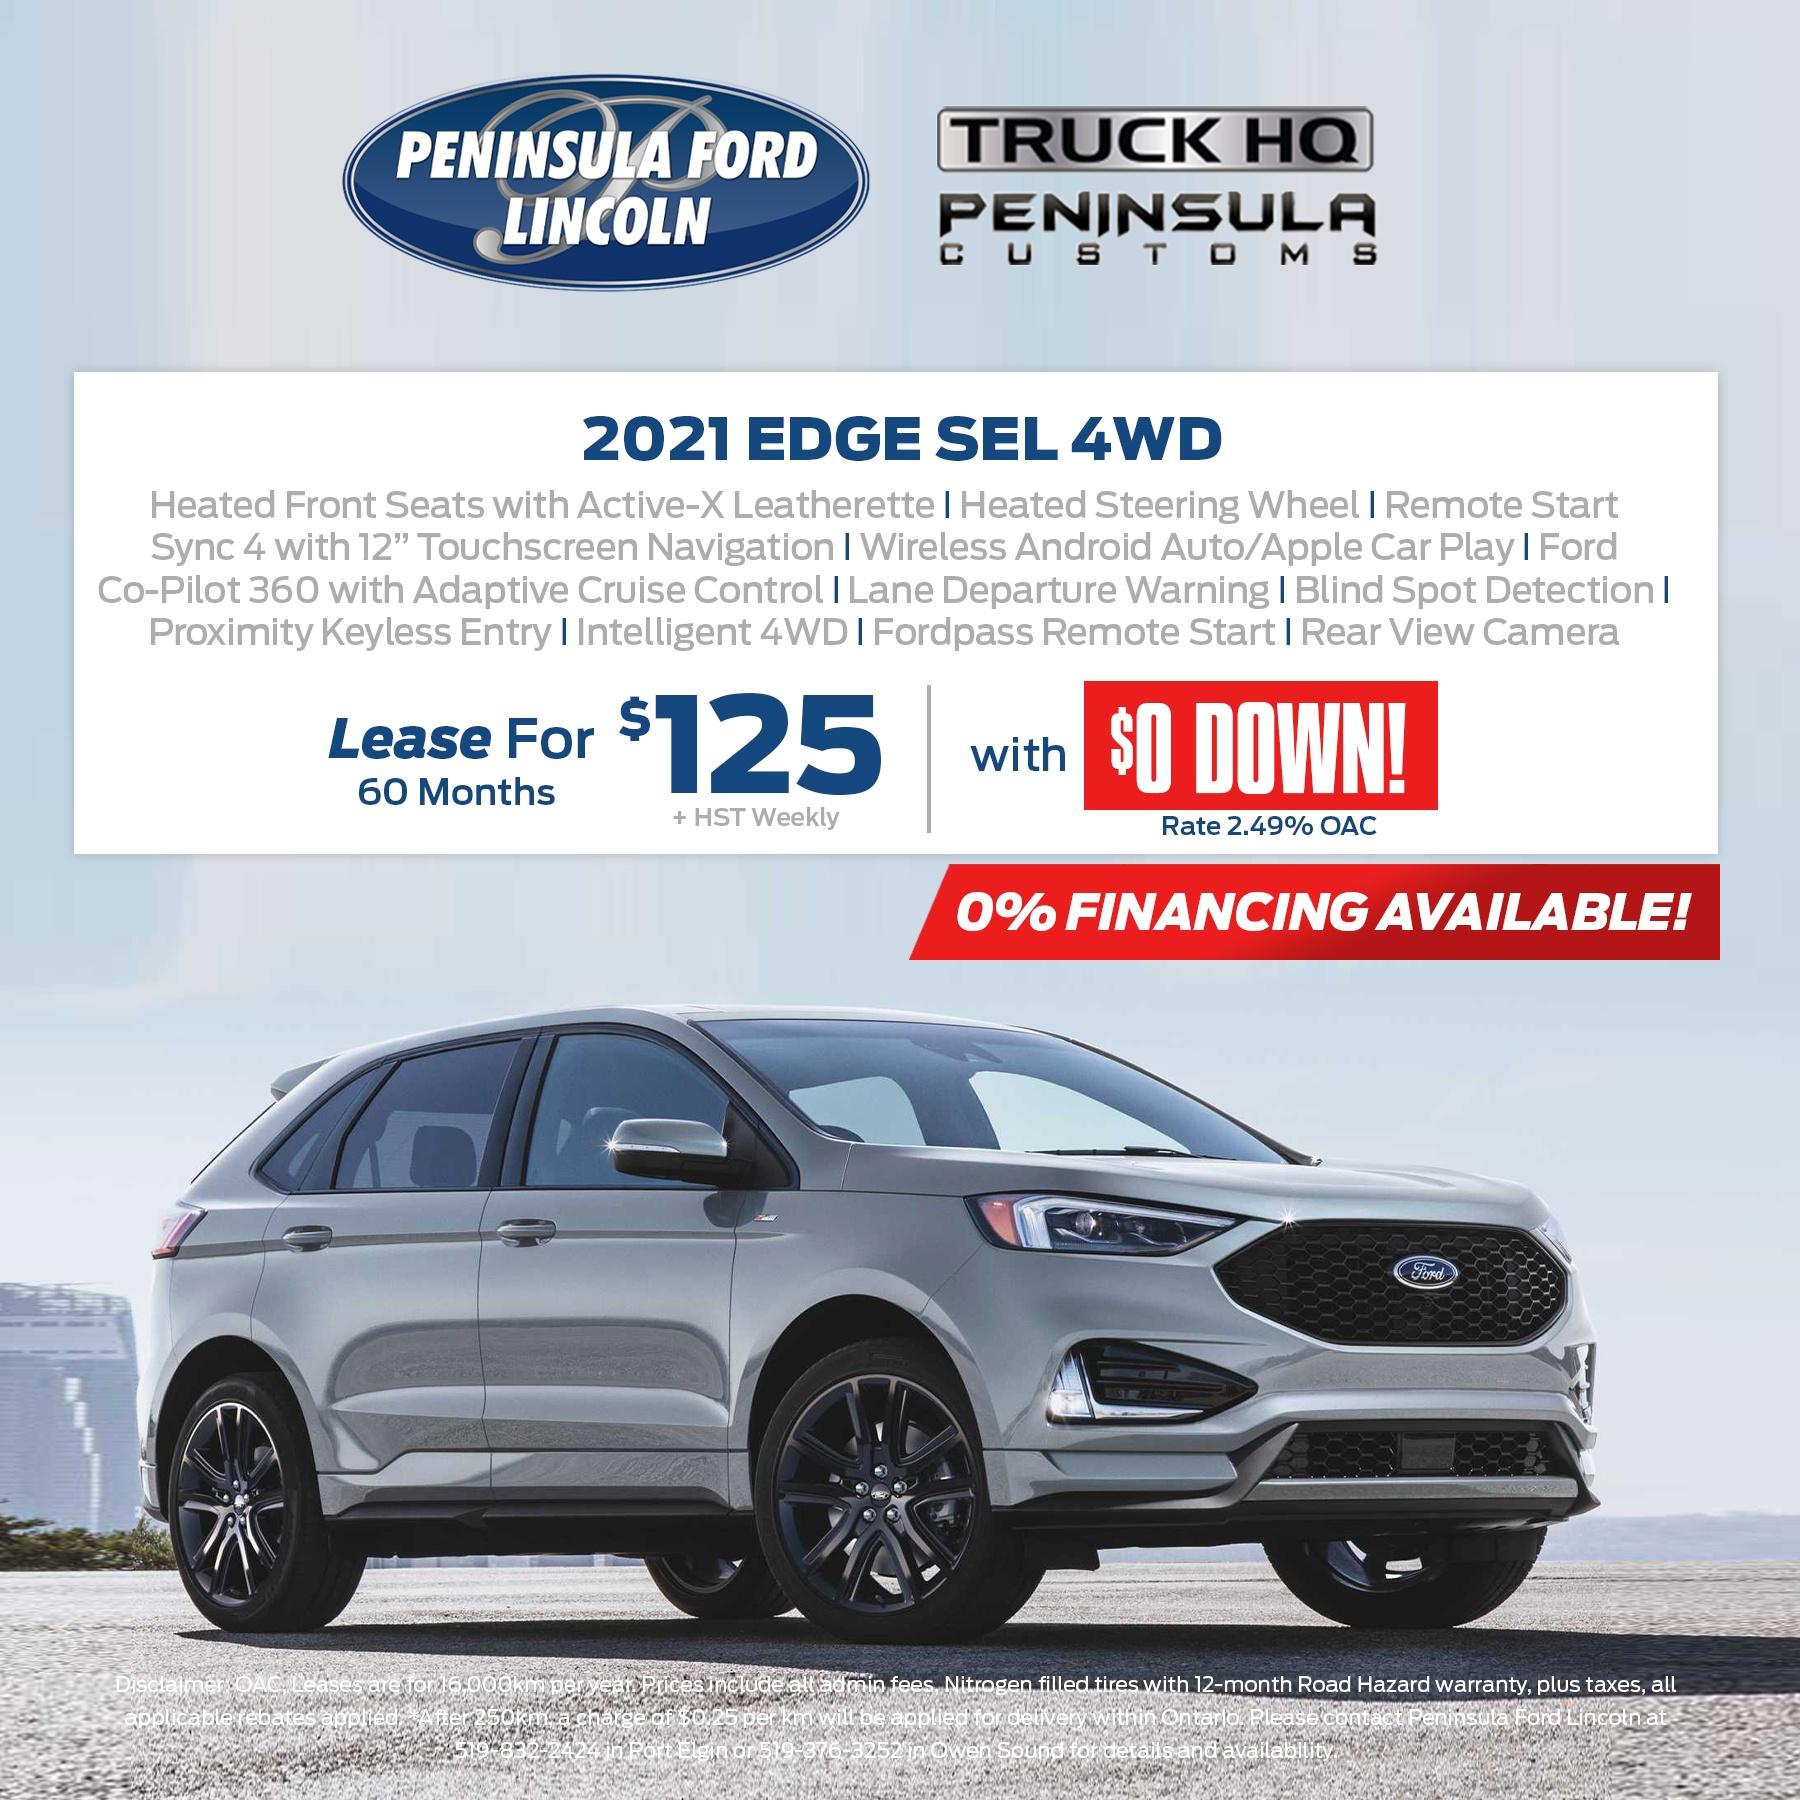 2021 EDGE SEL 4WD